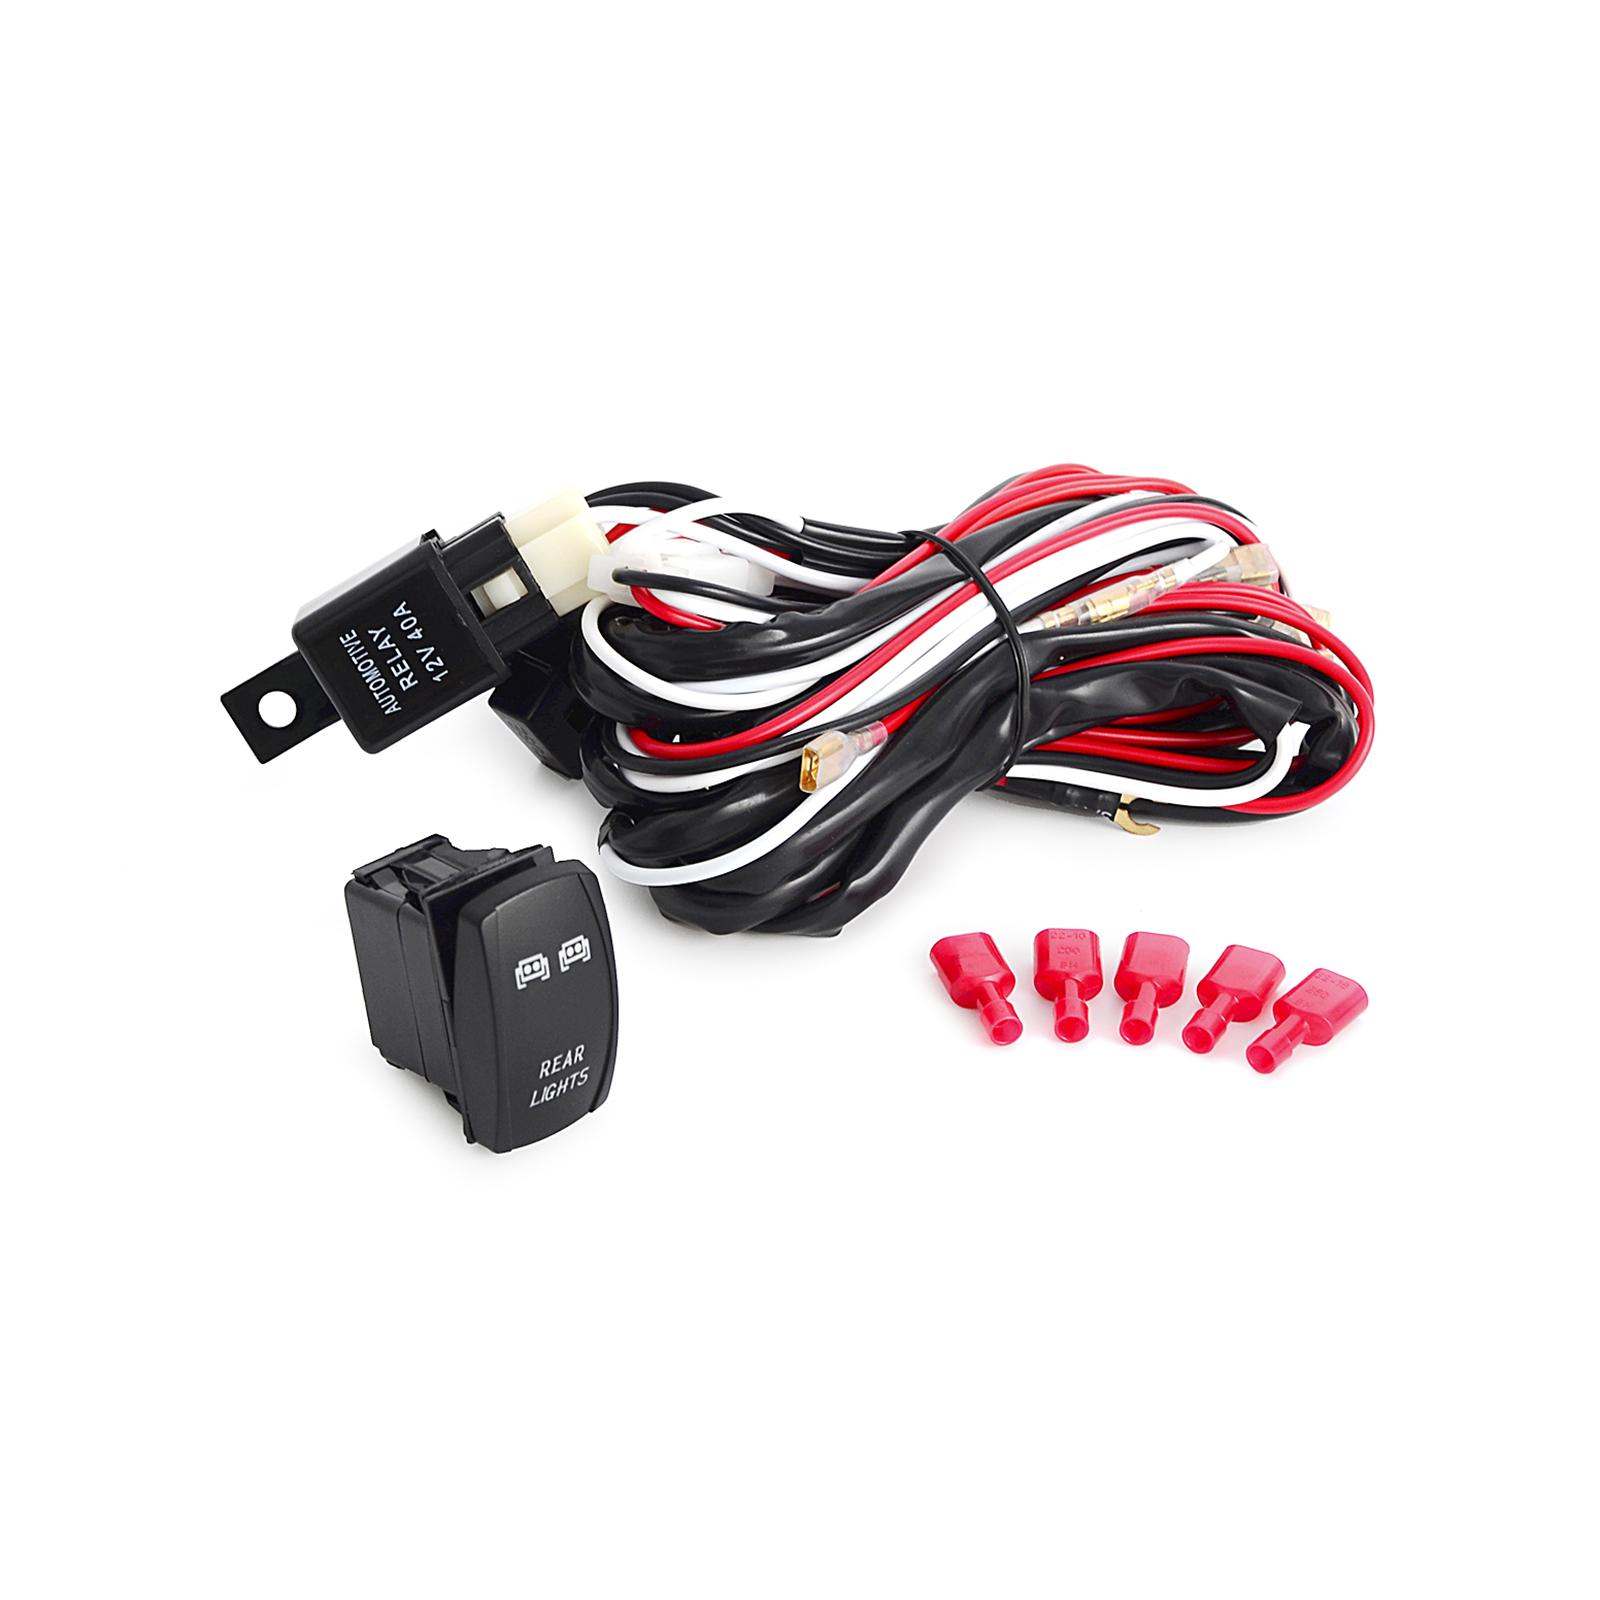 Wondrous Wiring Harness Rocker Switch Led Light Bar For Polaris Rzr Xp 1000 Wiring Digital Resources Funapmognl